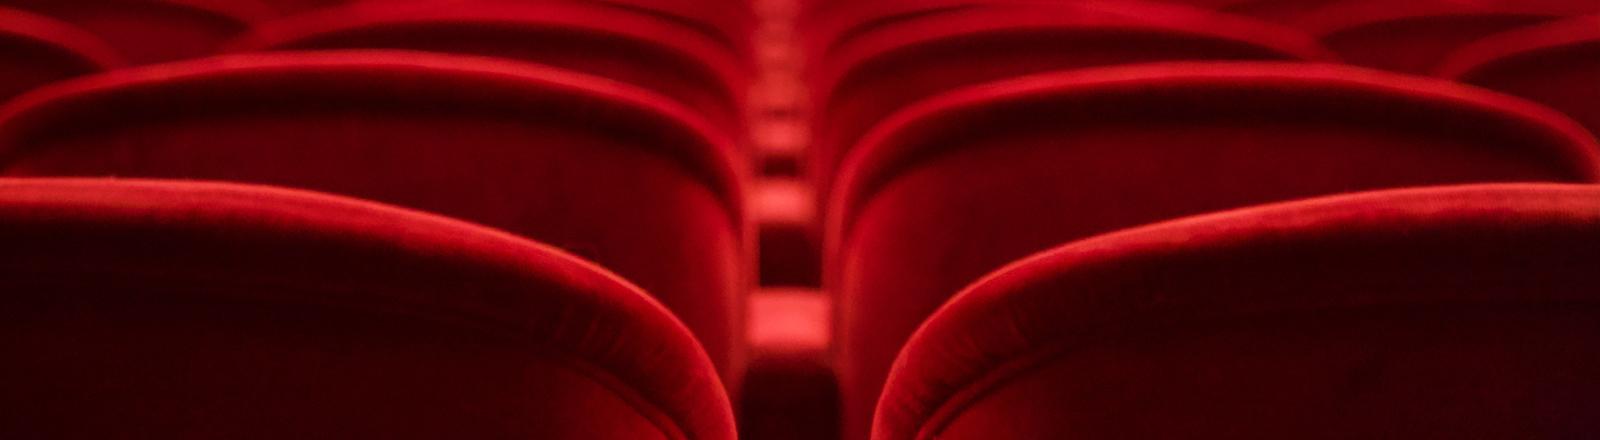 Sessel in einem Kinosaal